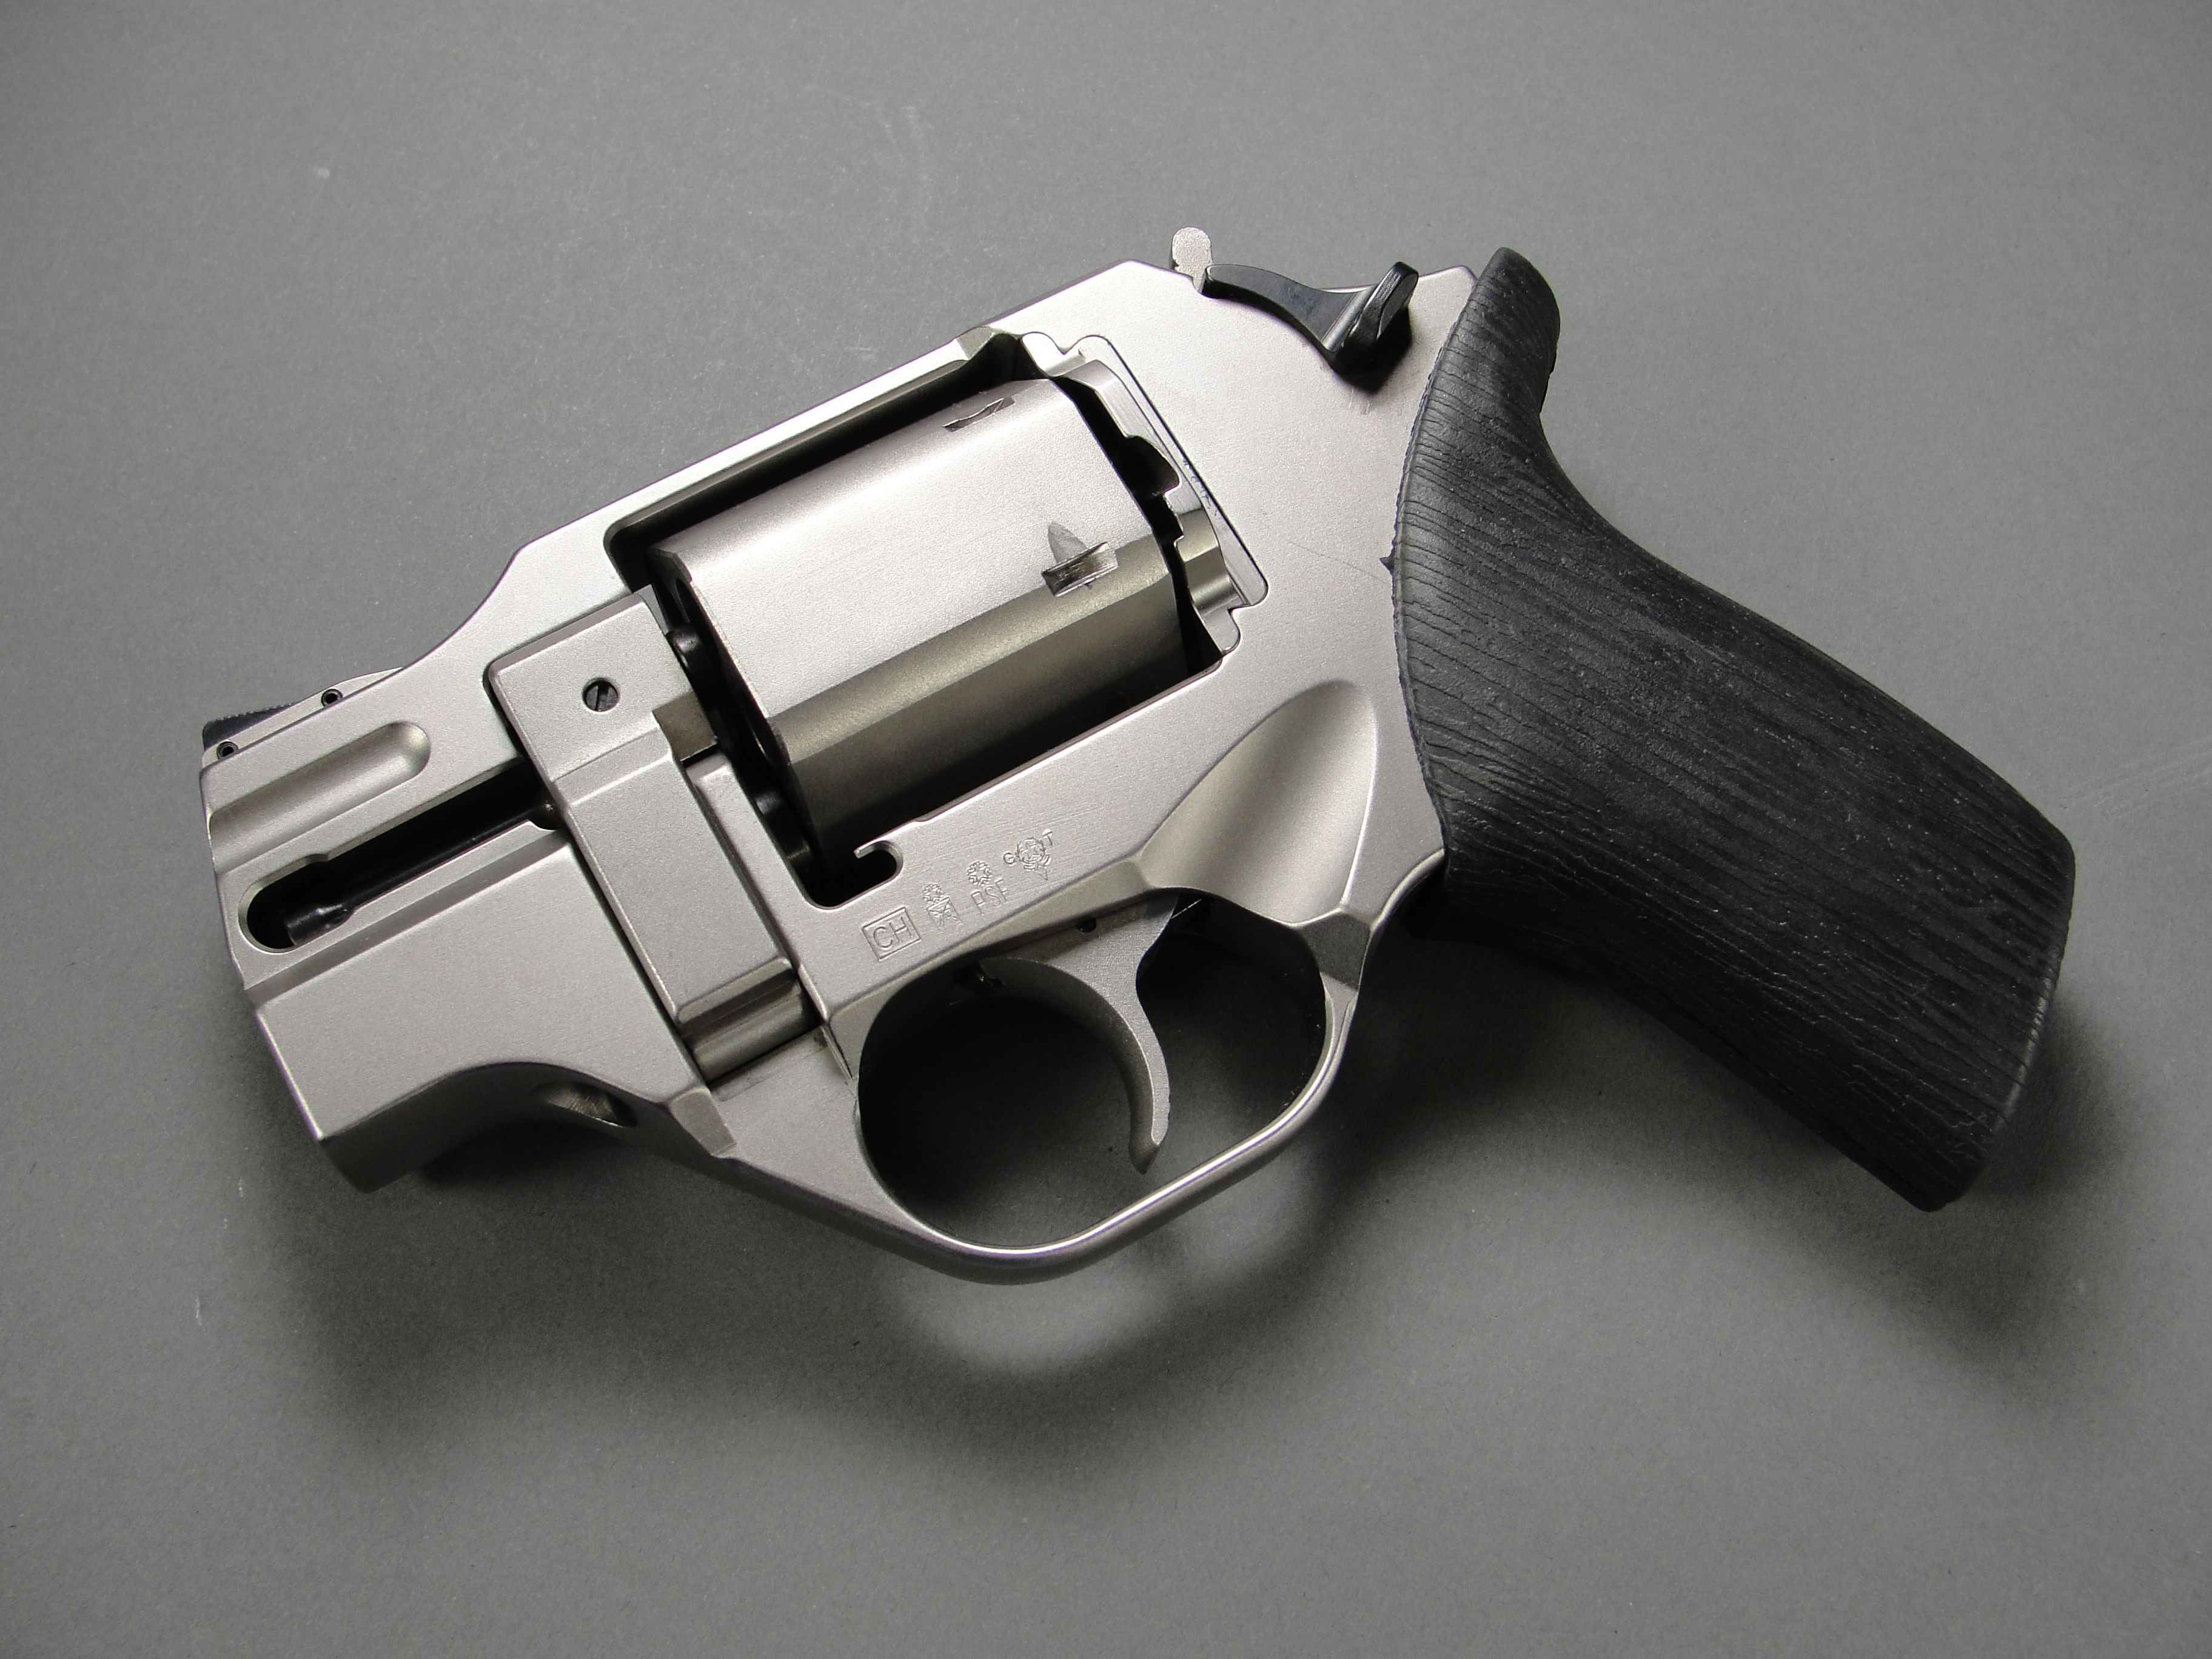 Chiappa 200DS White Rhino in .357 Magnum.